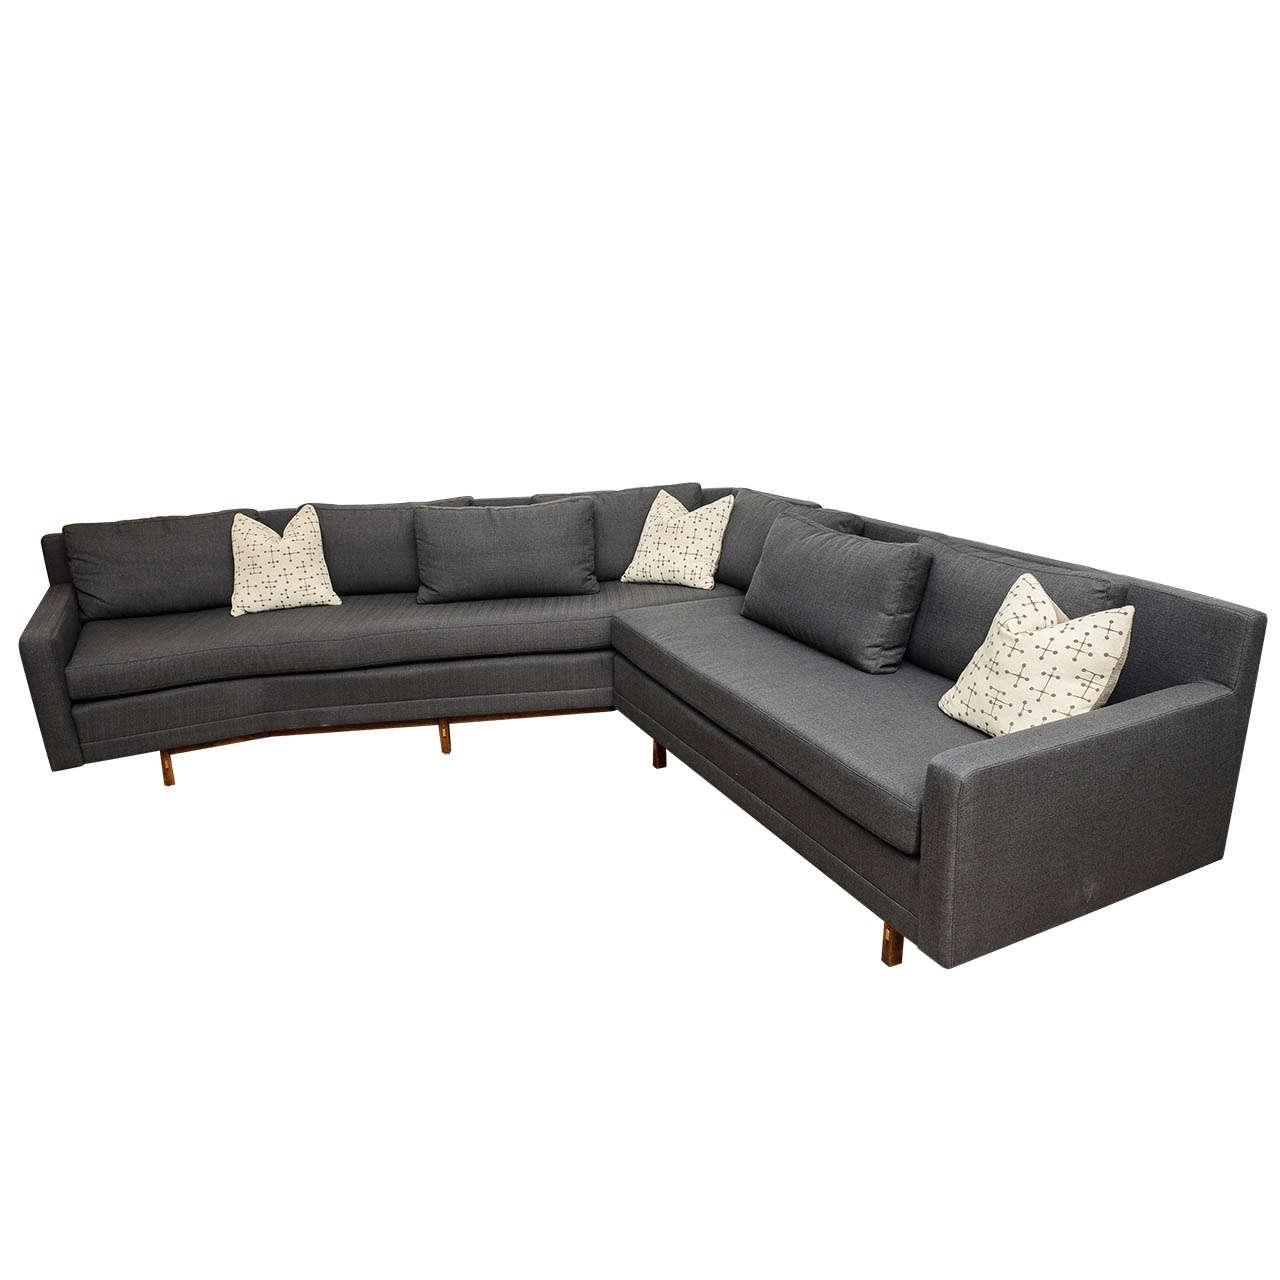 Sleek Sectional Sofas | Thecreativescientist inside Sleek Sectional Sofas (Image 9 of 10)